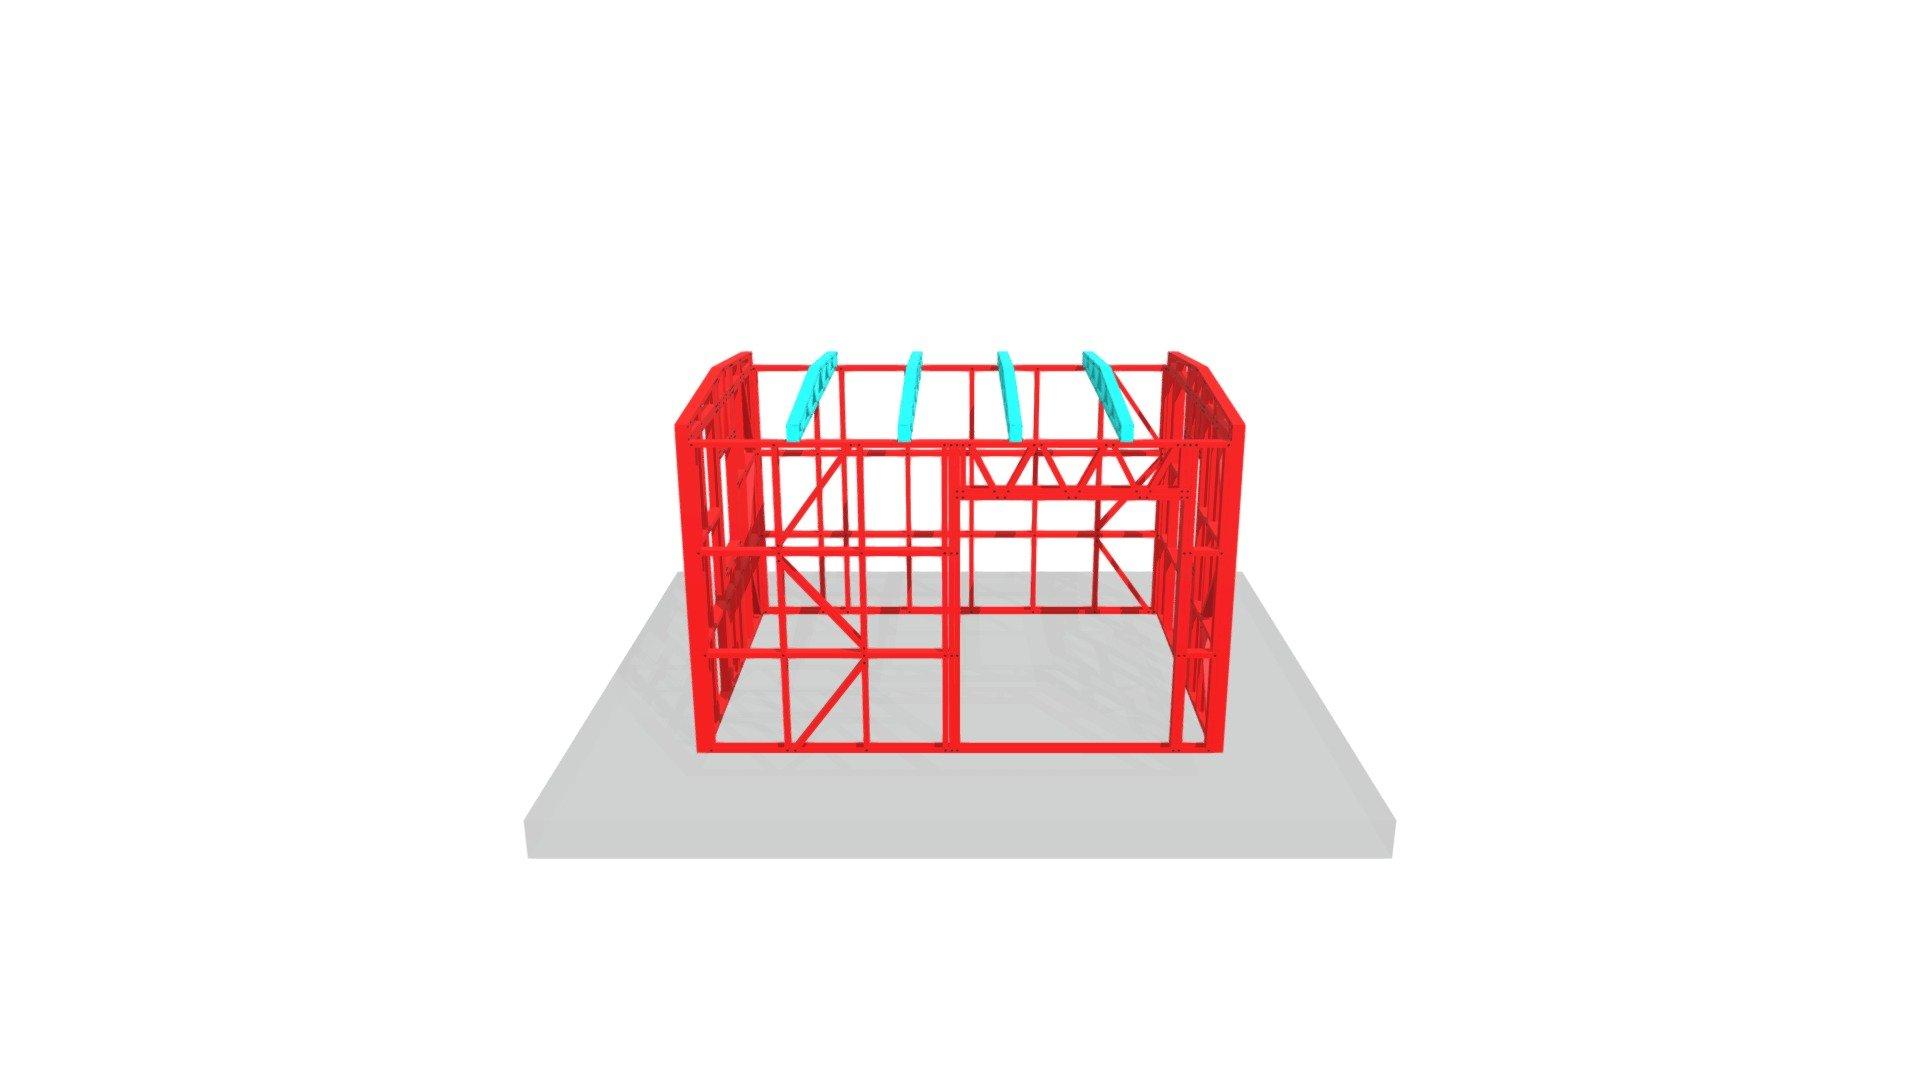 12761A - Download Free 3D model by ZahnSelmer (@ZahnSelmer